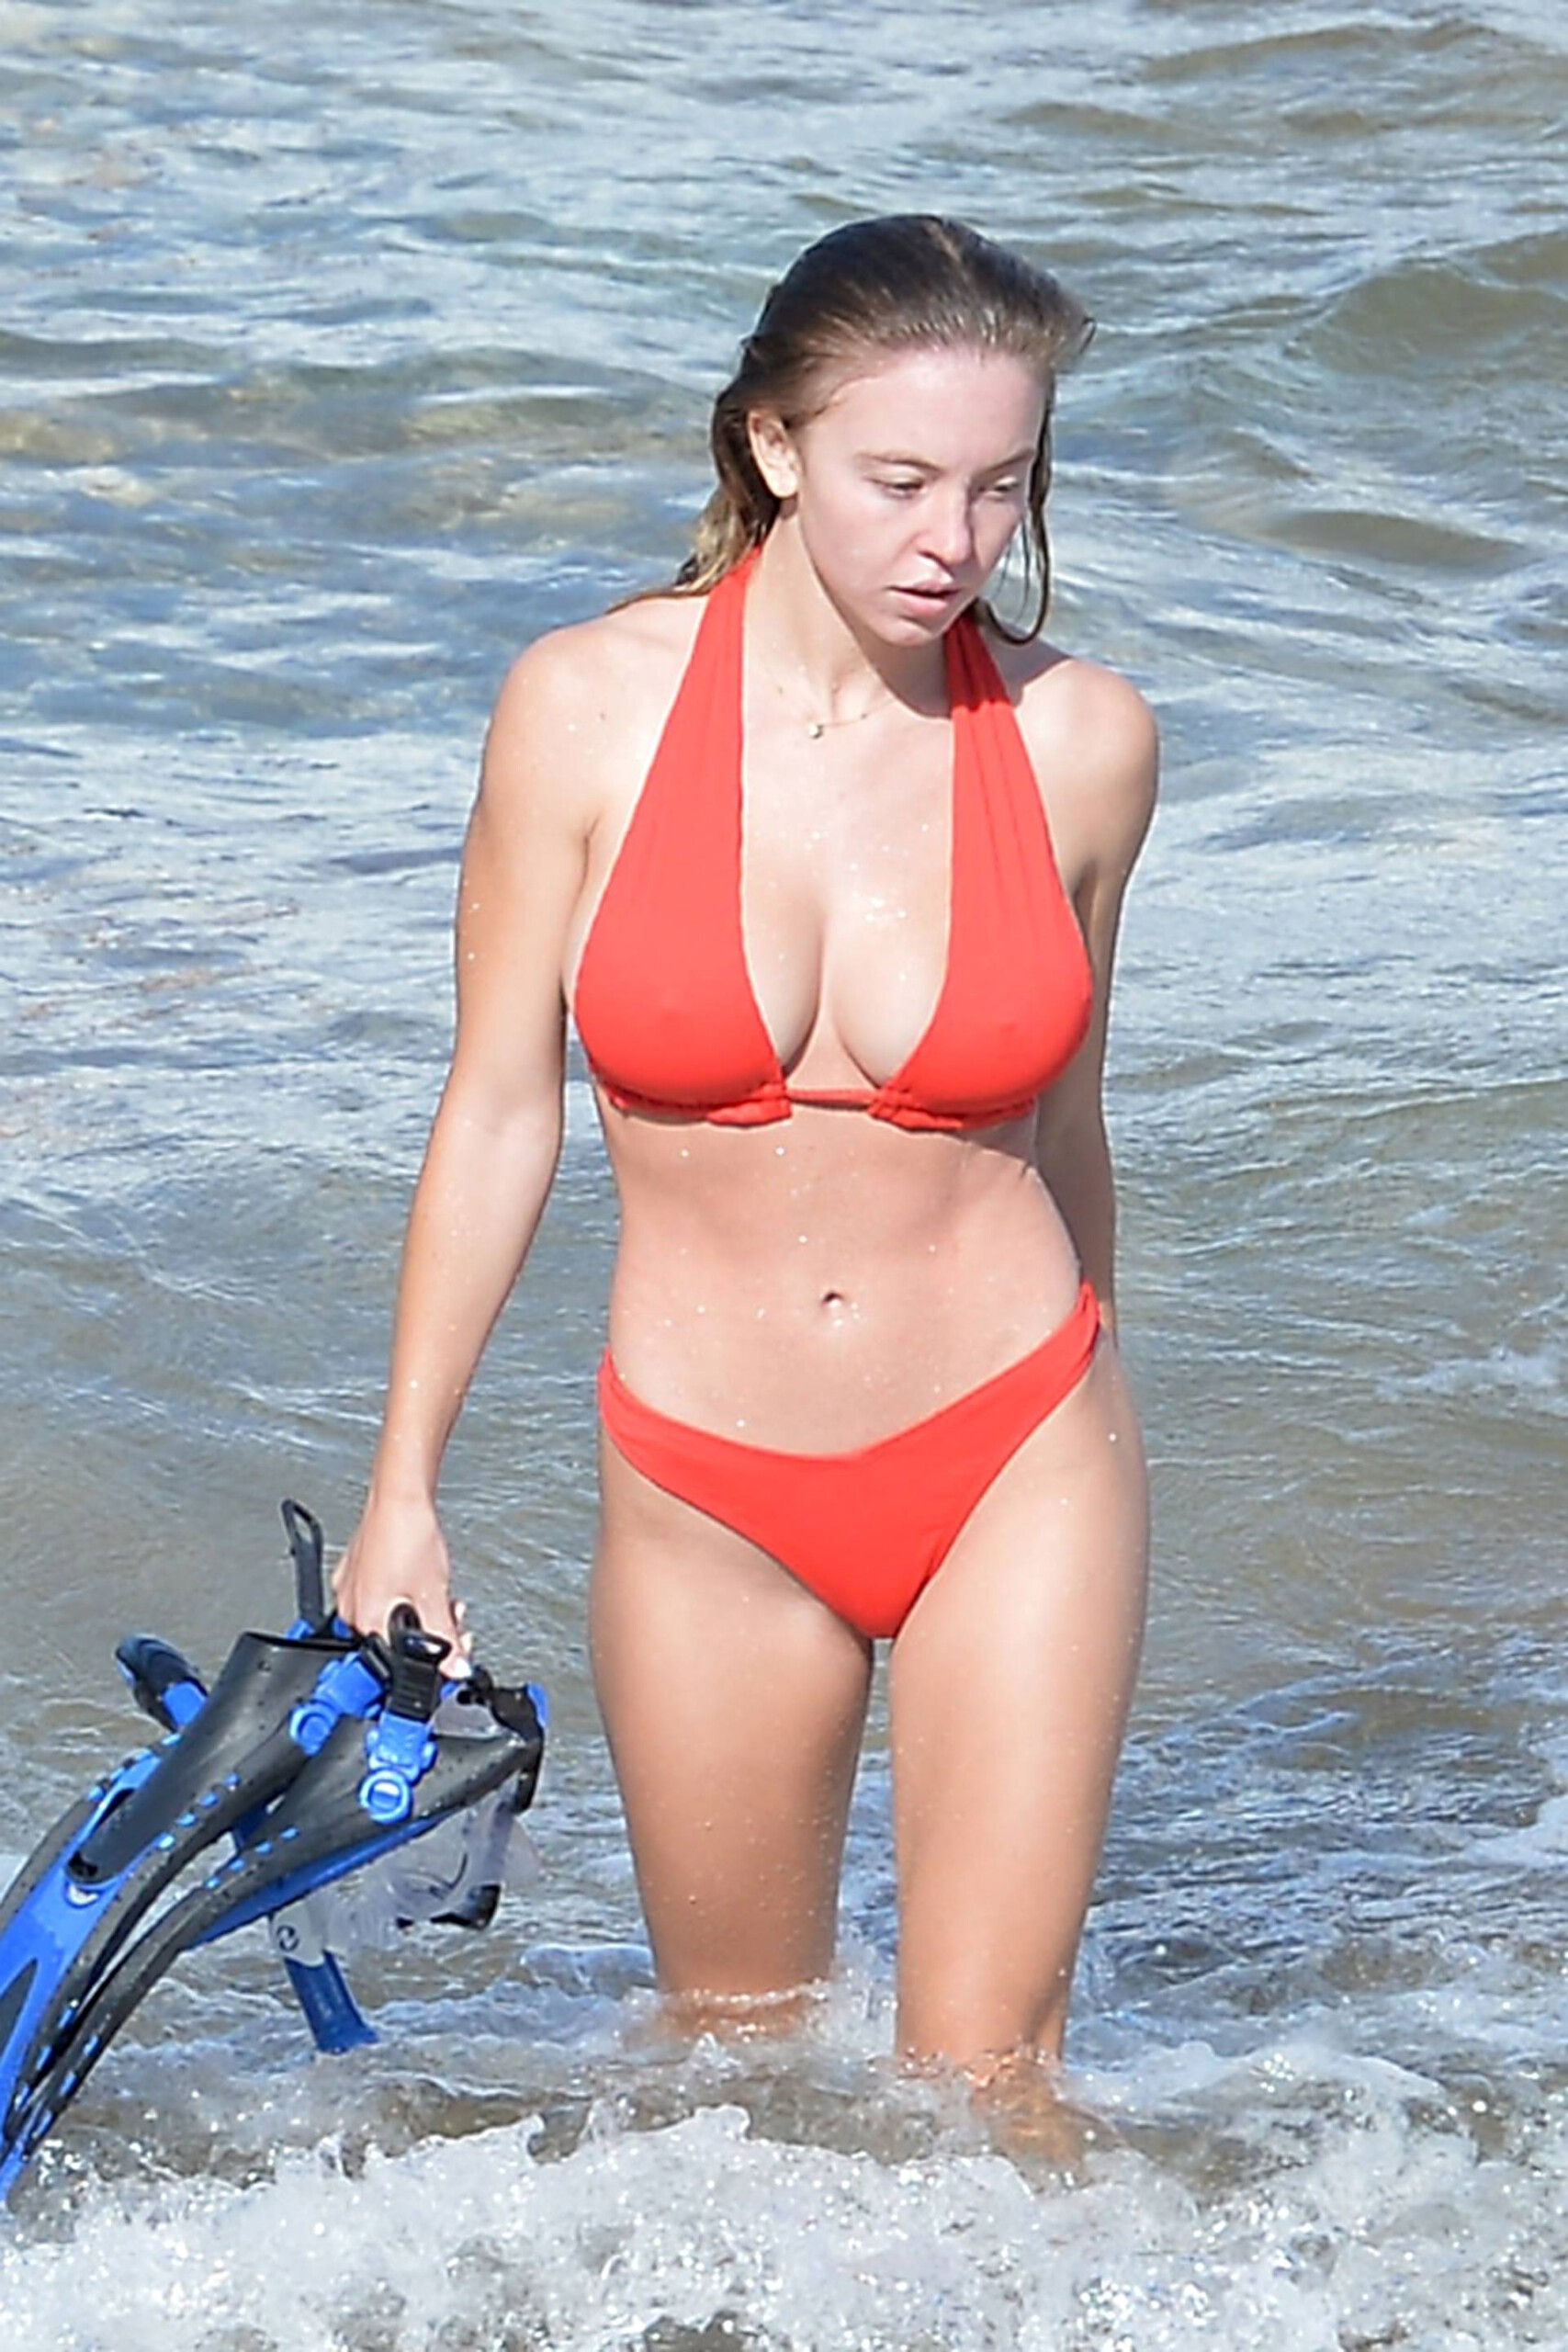 Sydney Sweeney - Sexy Boobs and Ass in a Tiny Bikini on